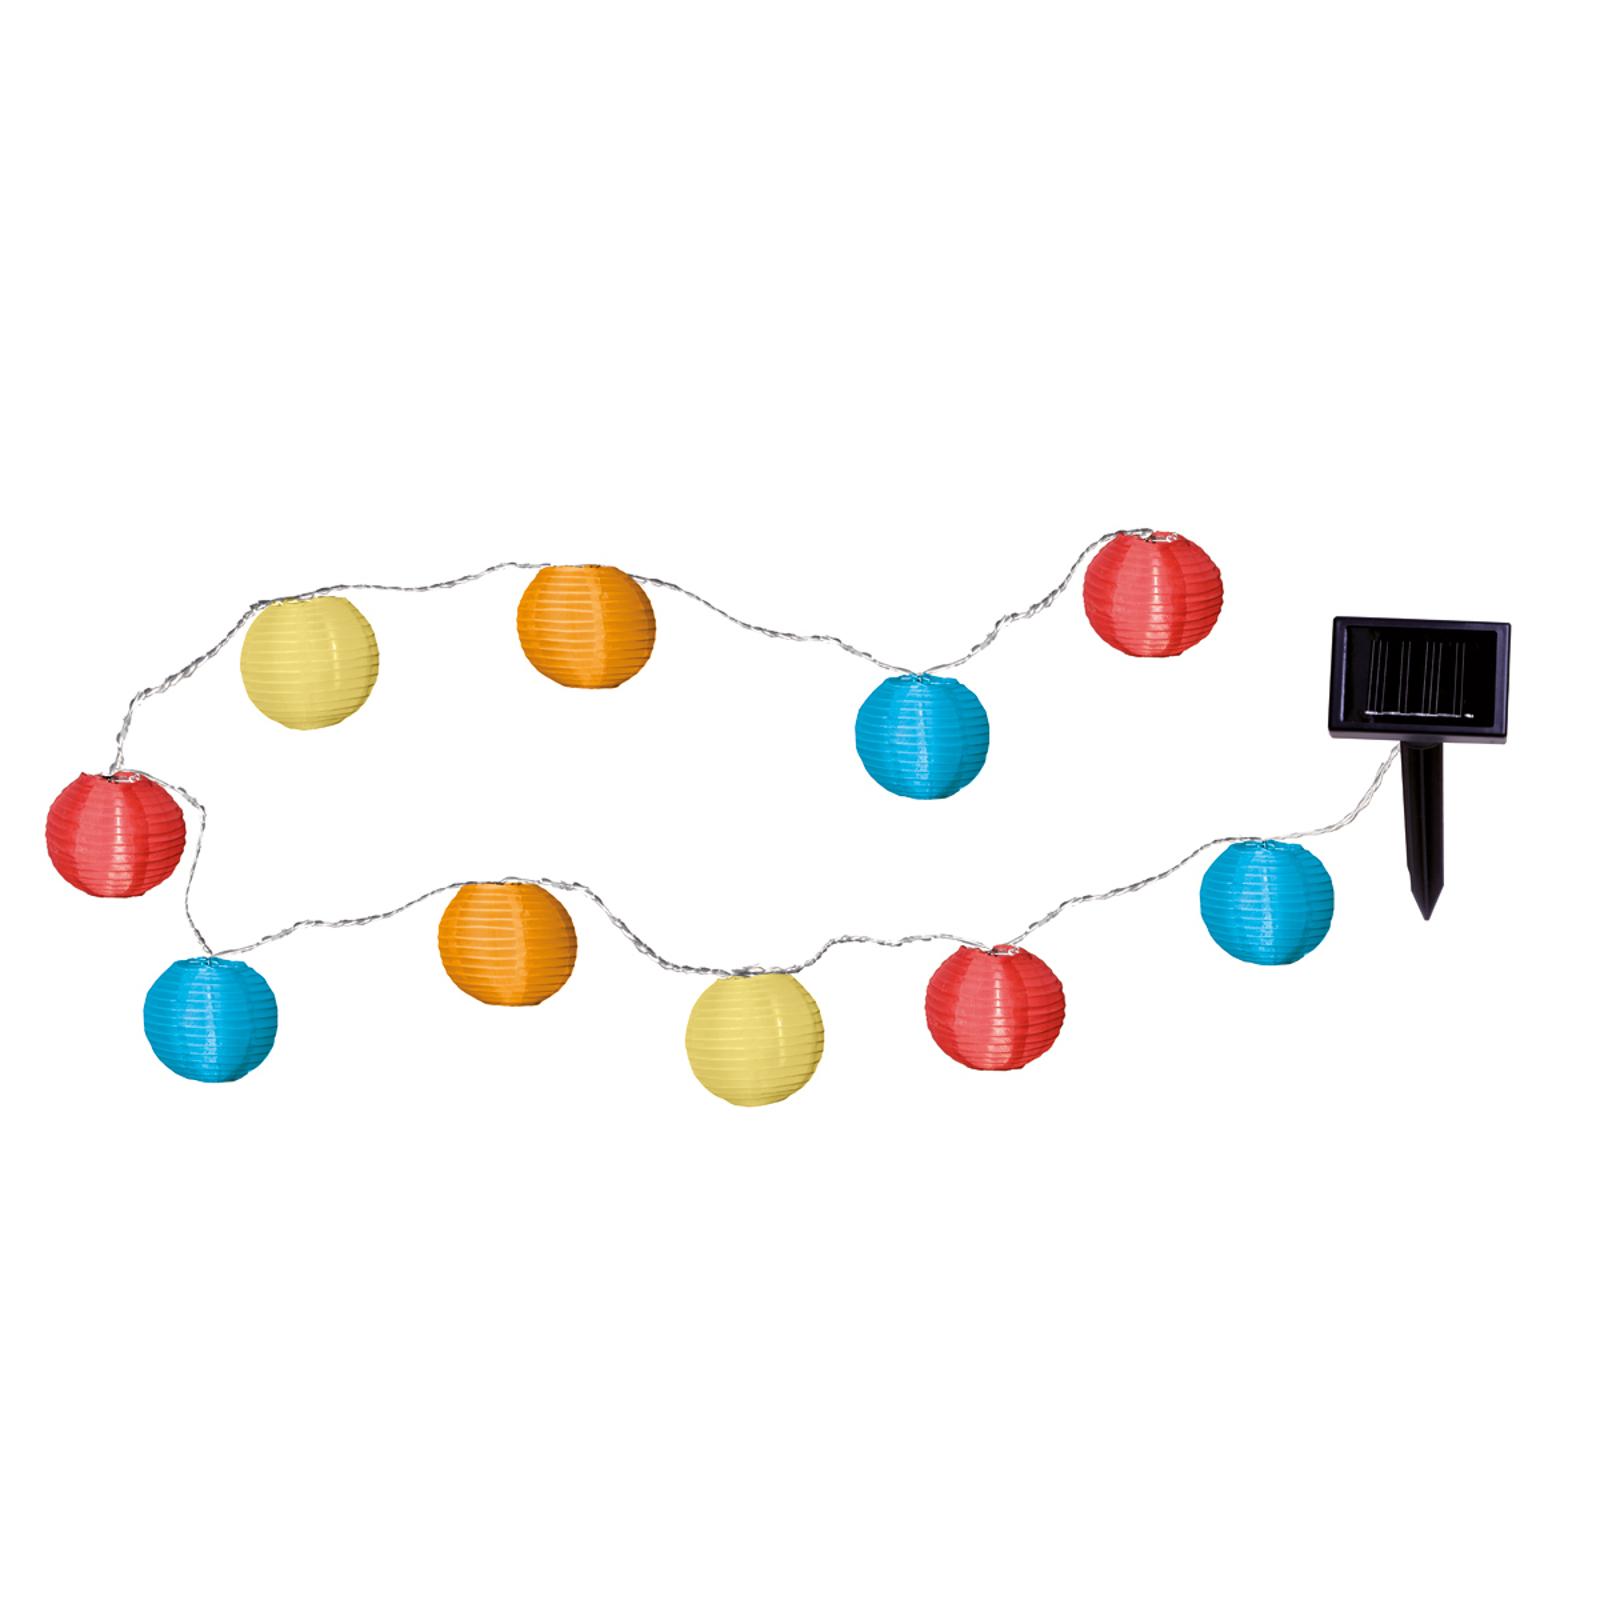 Farebná solárna svetelná LED reťaz s 10 lampiónmi_1522130_1